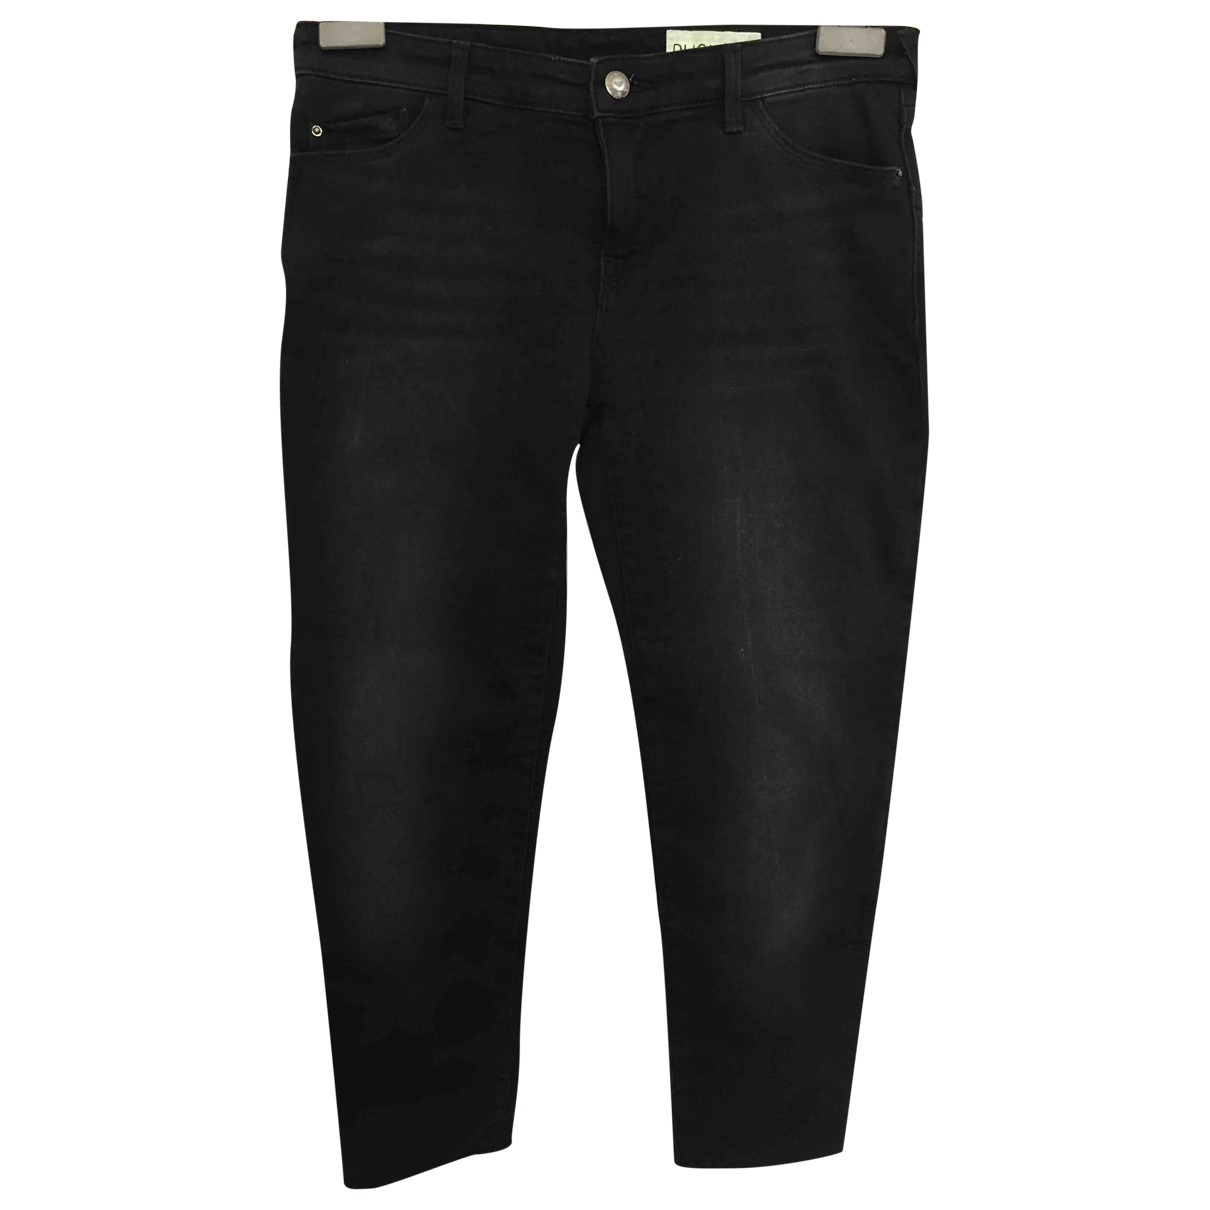 Emporio Armani \N Black Cotton Jeans for Women 27 US